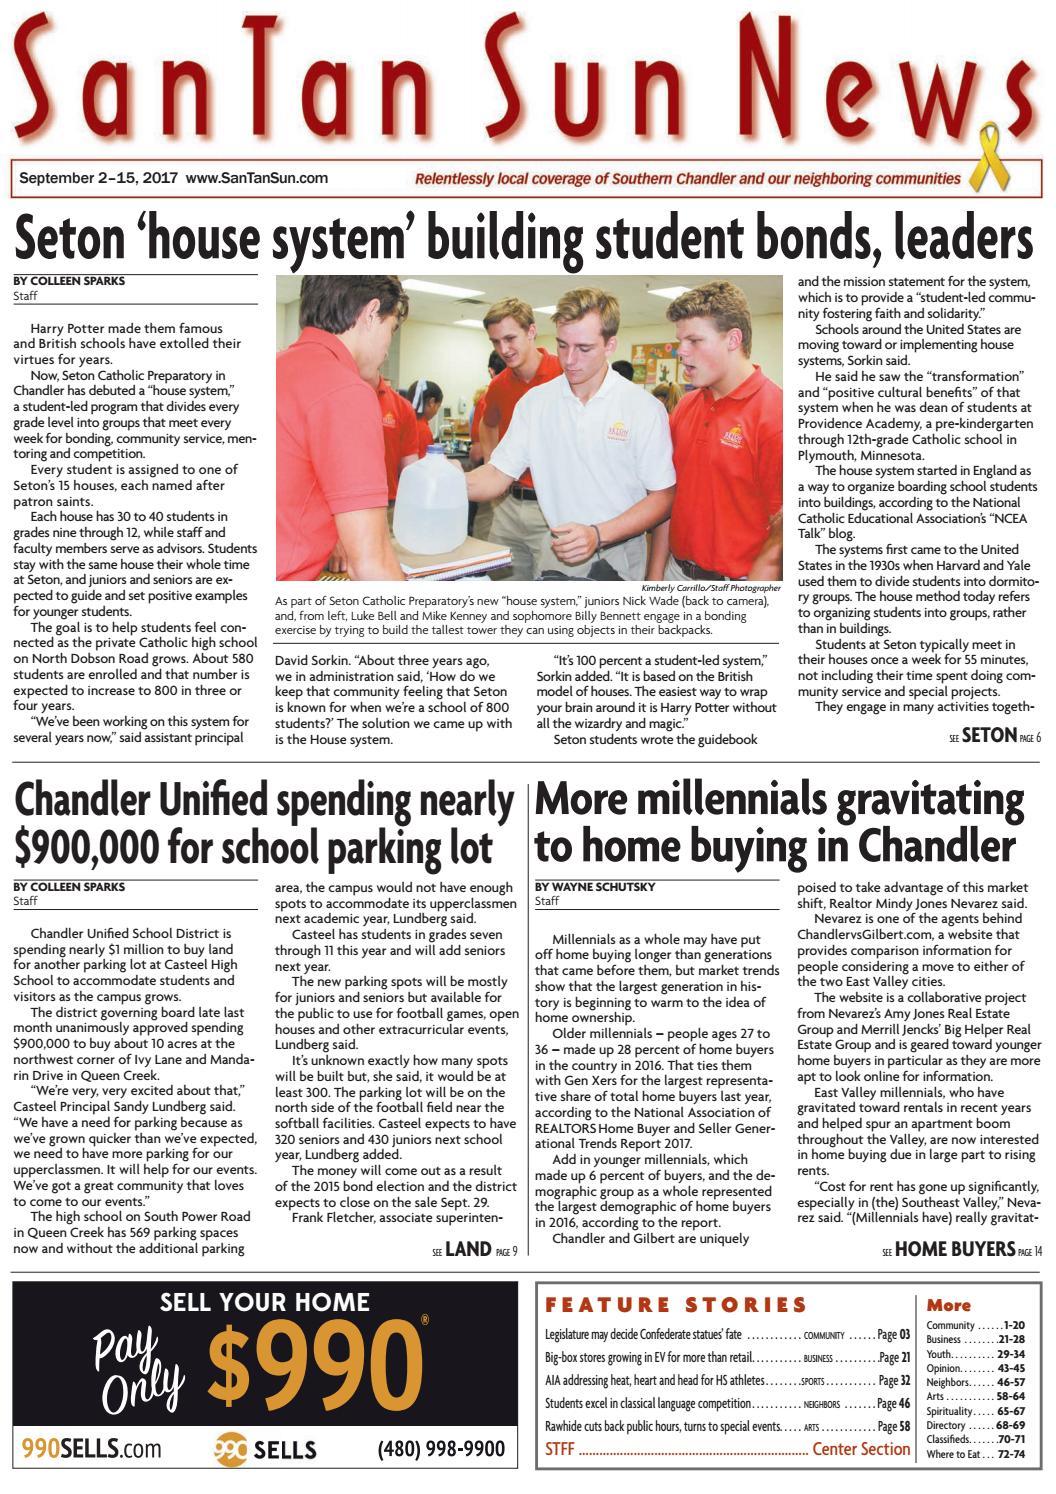 SanTan Sun News - September 2, 2017